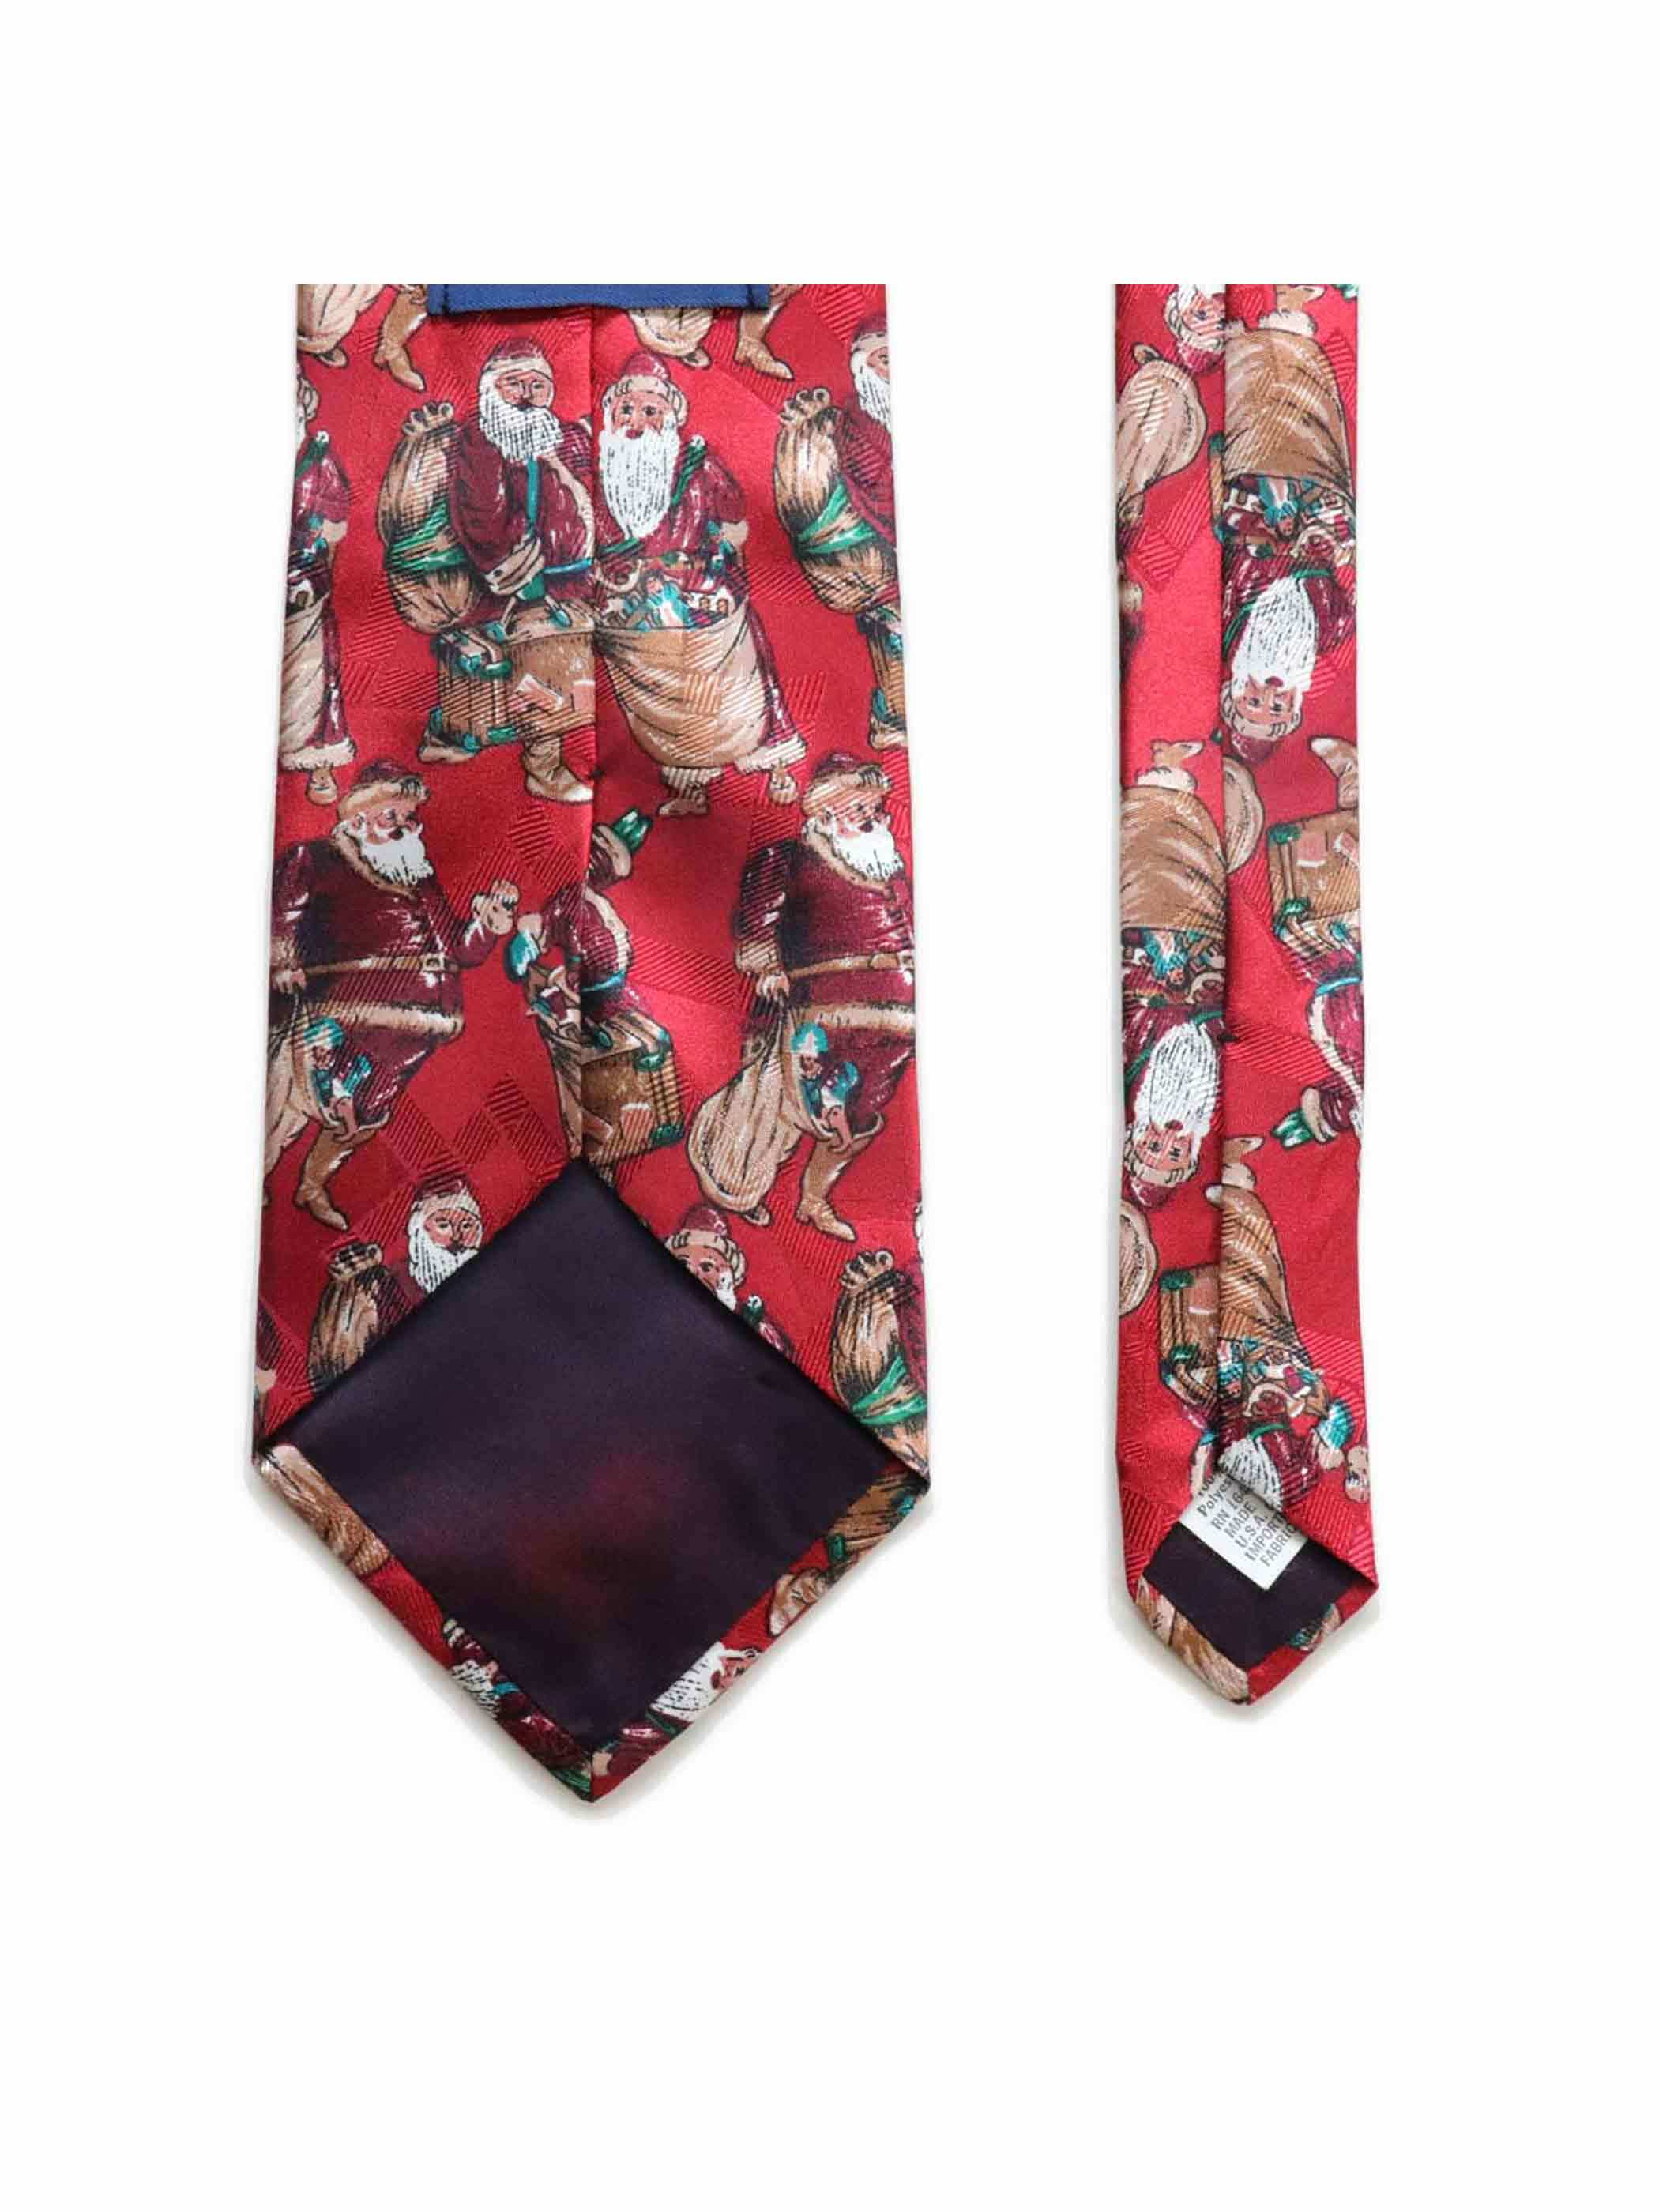 80's CAMDEN COURT USA製 サンタクロース柄 クリスマス ネクタイ